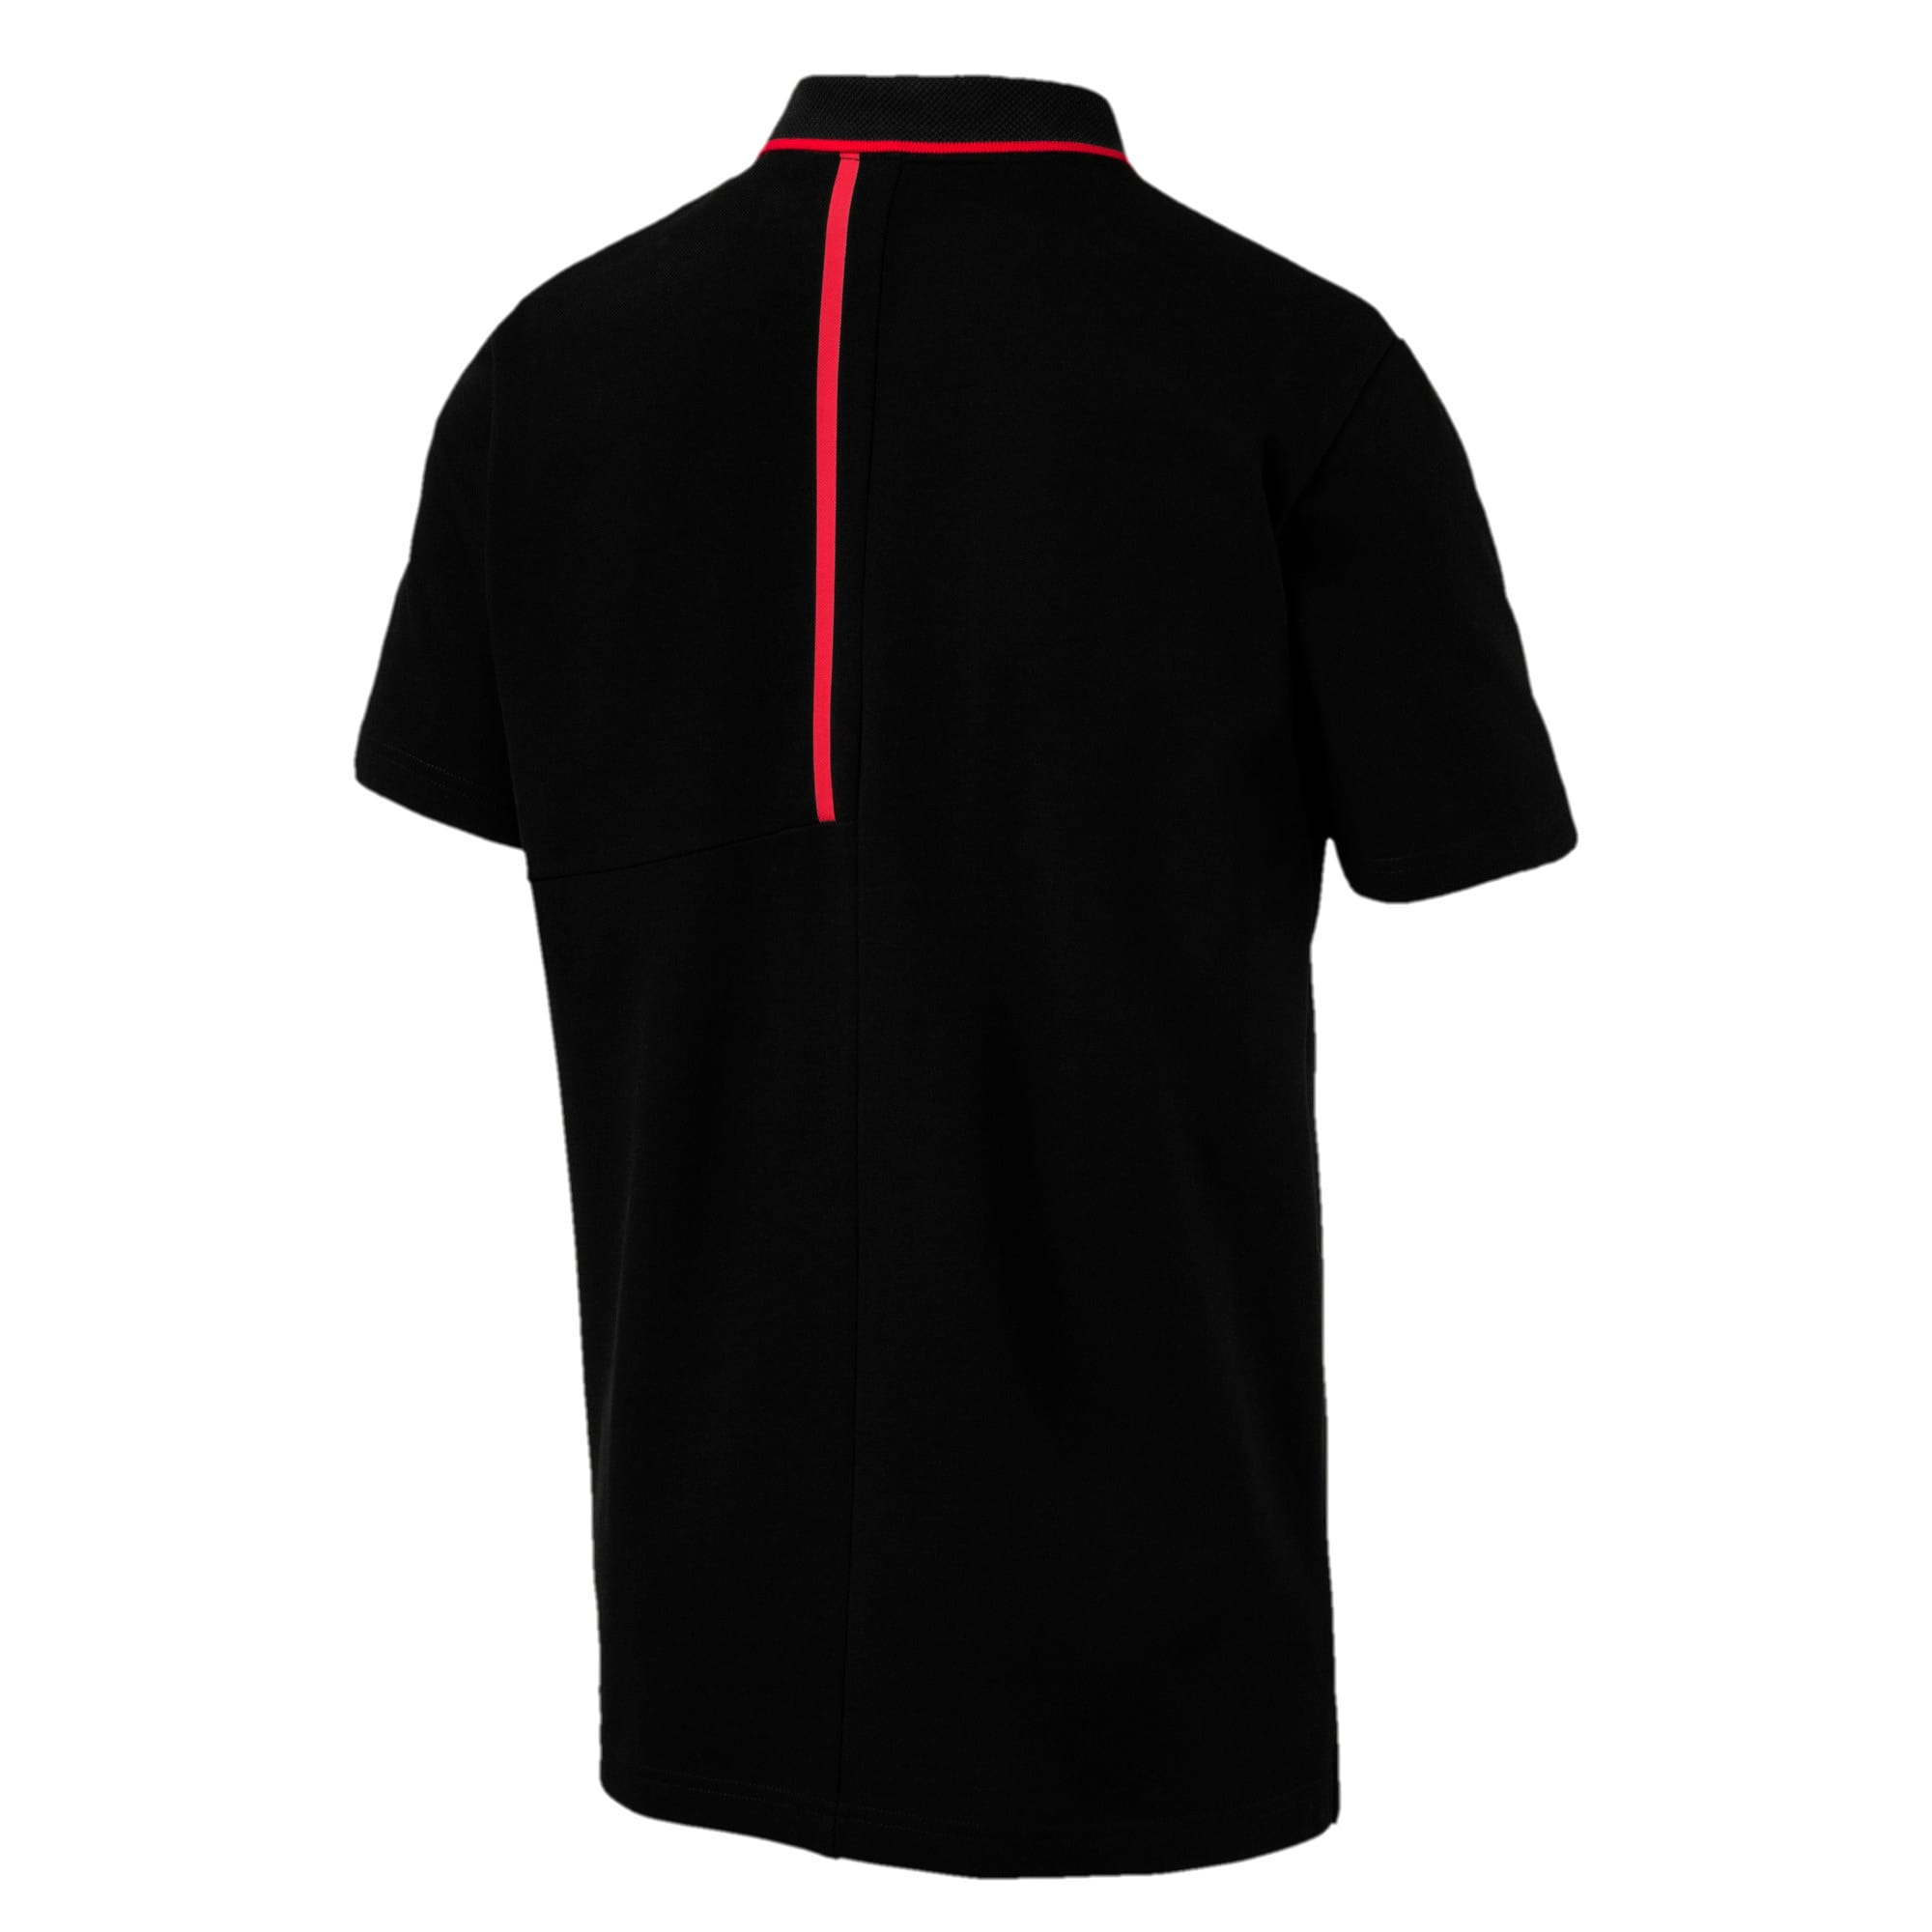 Thumbnail 4 of Ferrari Men's Polo, Puma Black, medium-IND